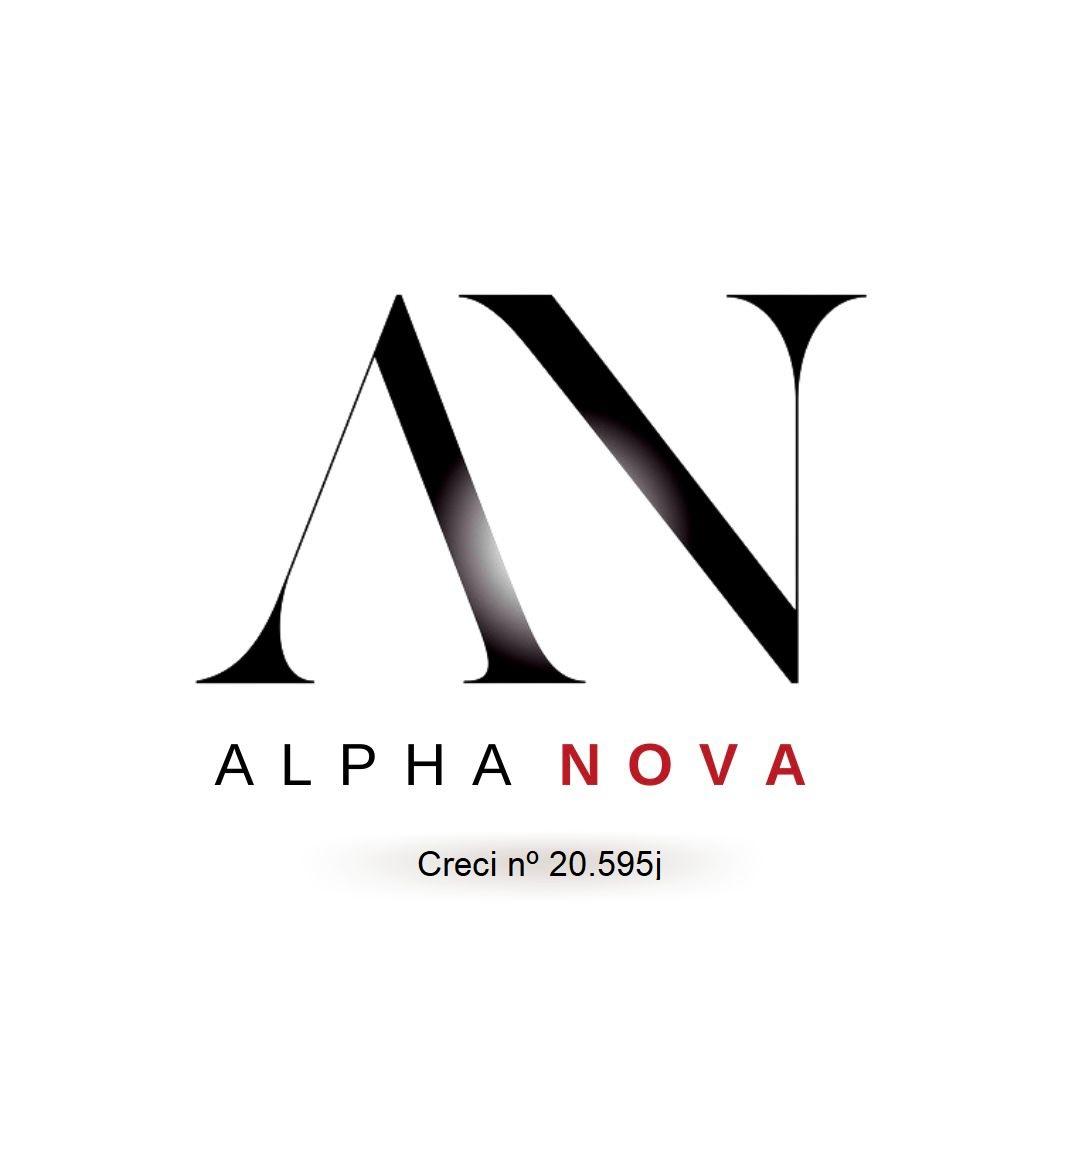 https://alphanova.com.br